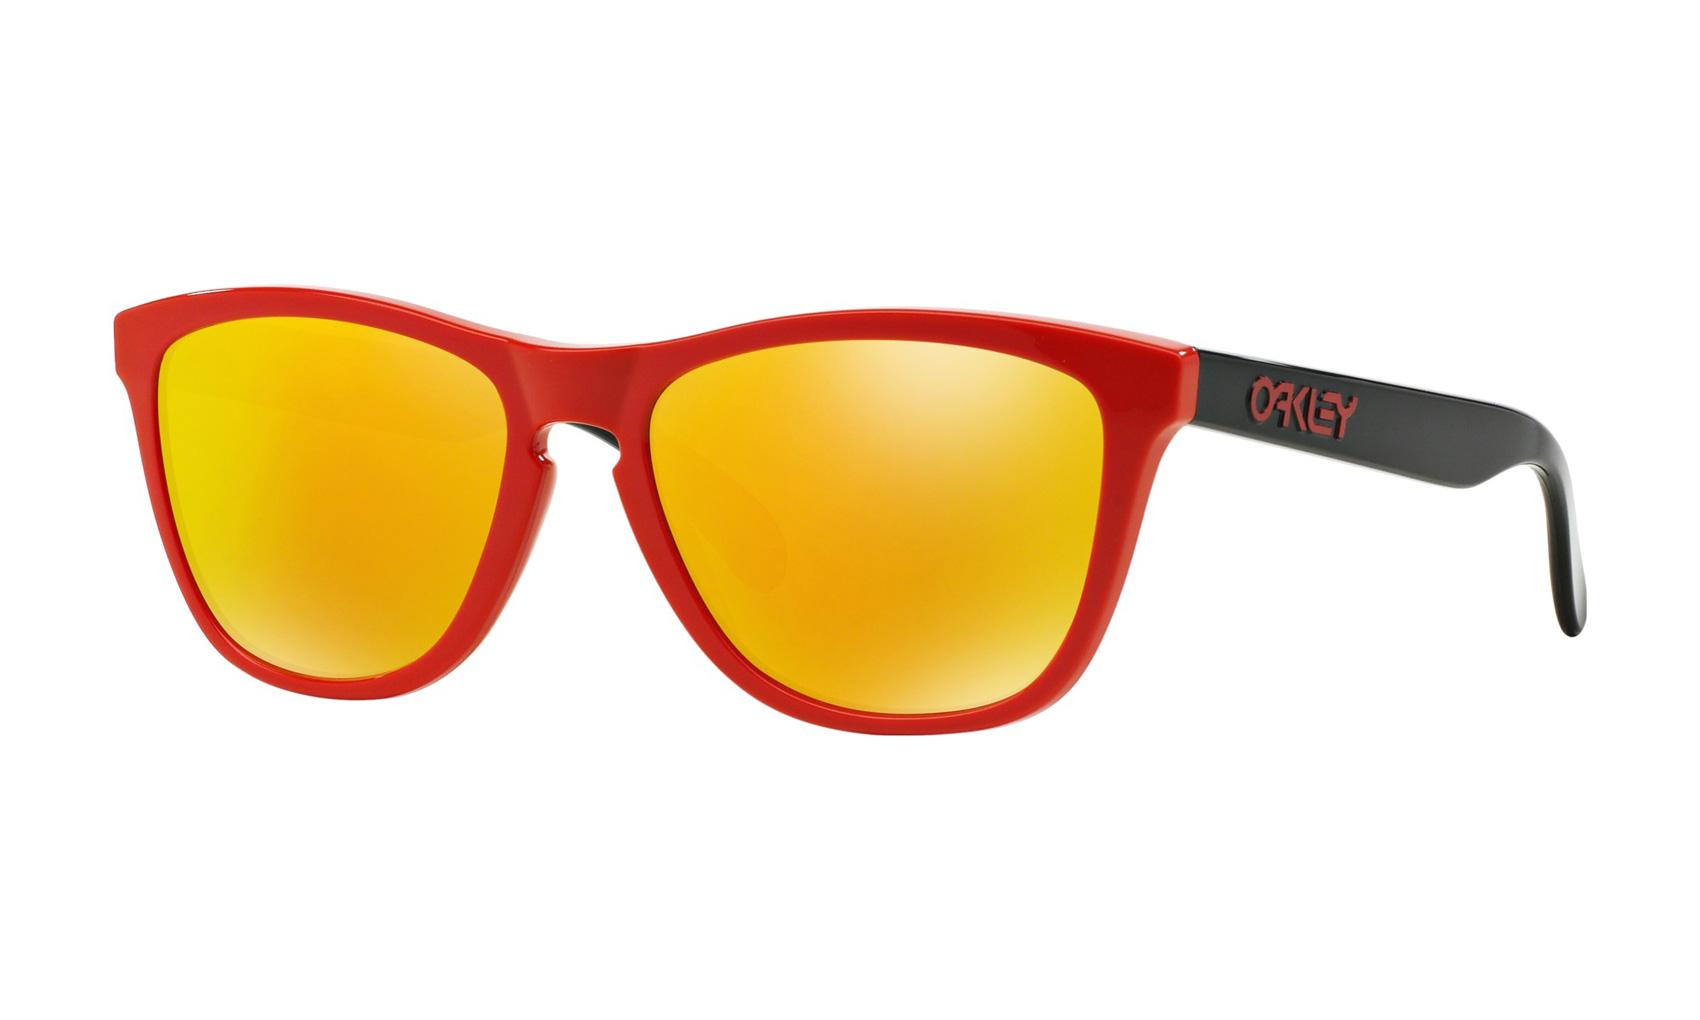 aa04c415d7 Oakley Frogskins Sunglasses Heritage Red Fire Iridium